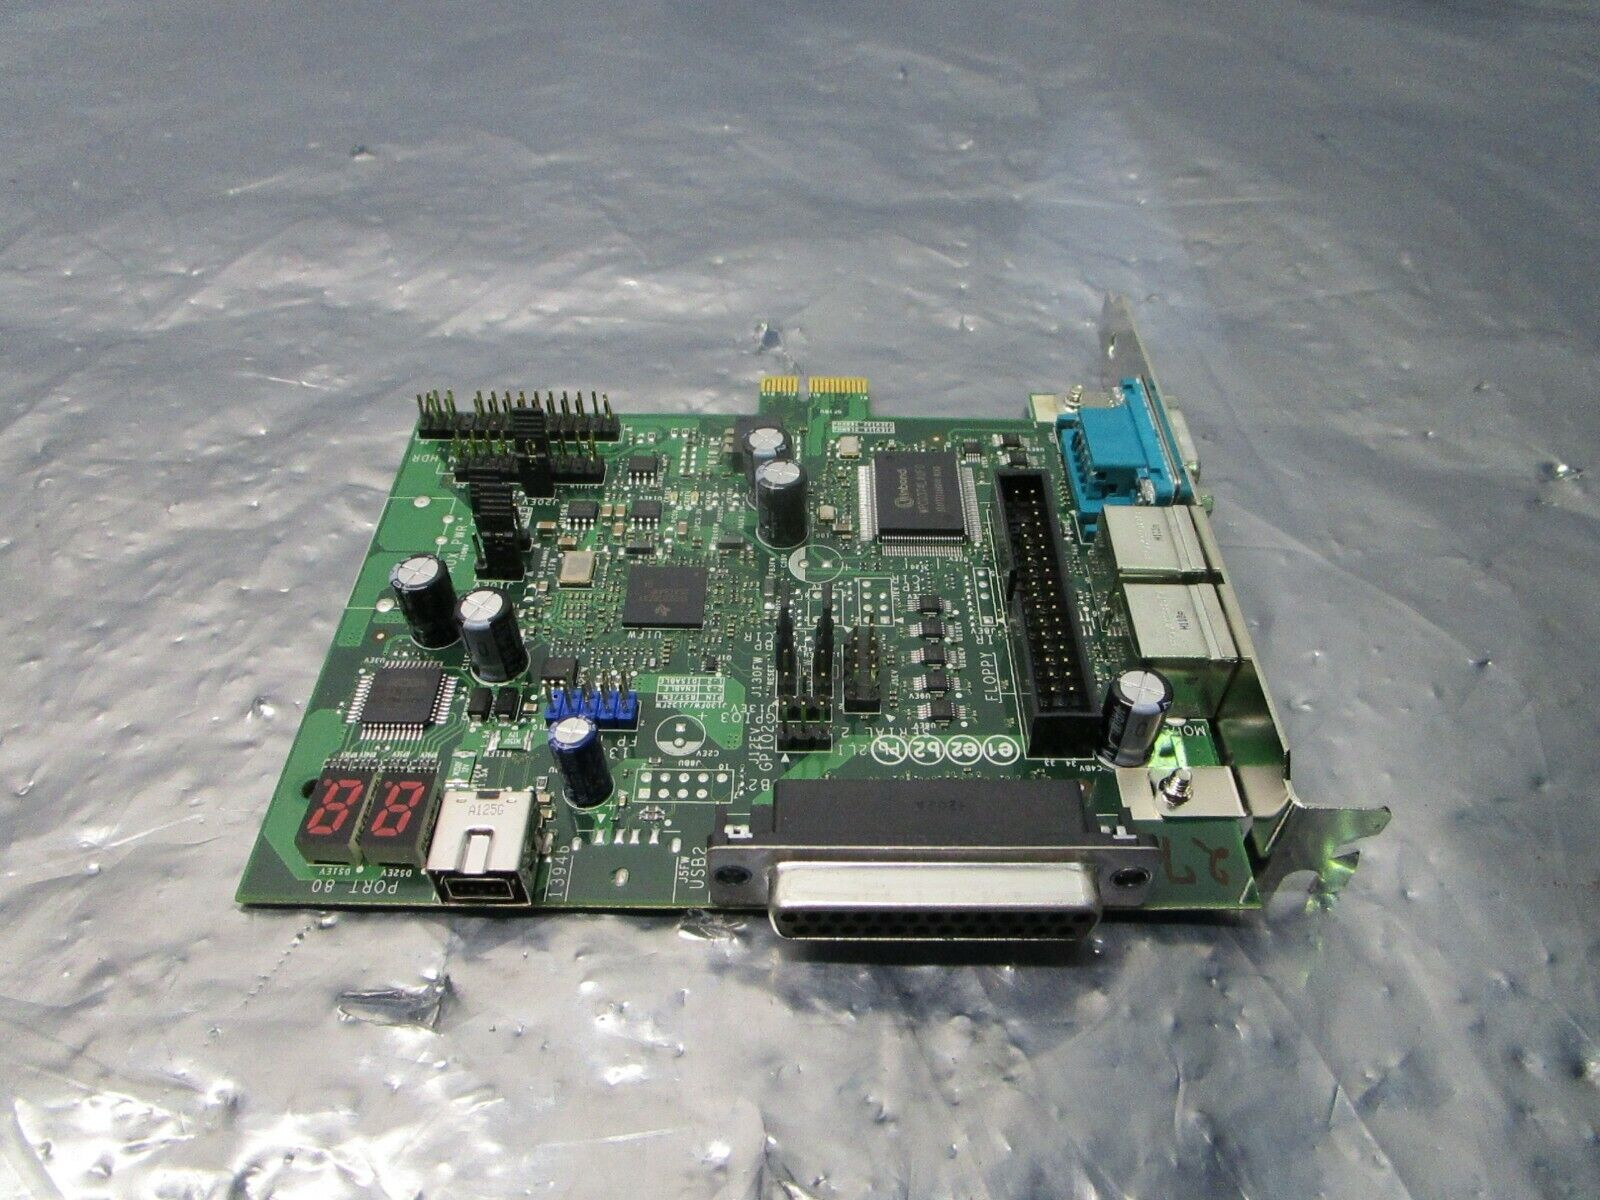 Intel SPRB23700334 Desktop Board Legacy Daughter Card 2, PCB, 101541